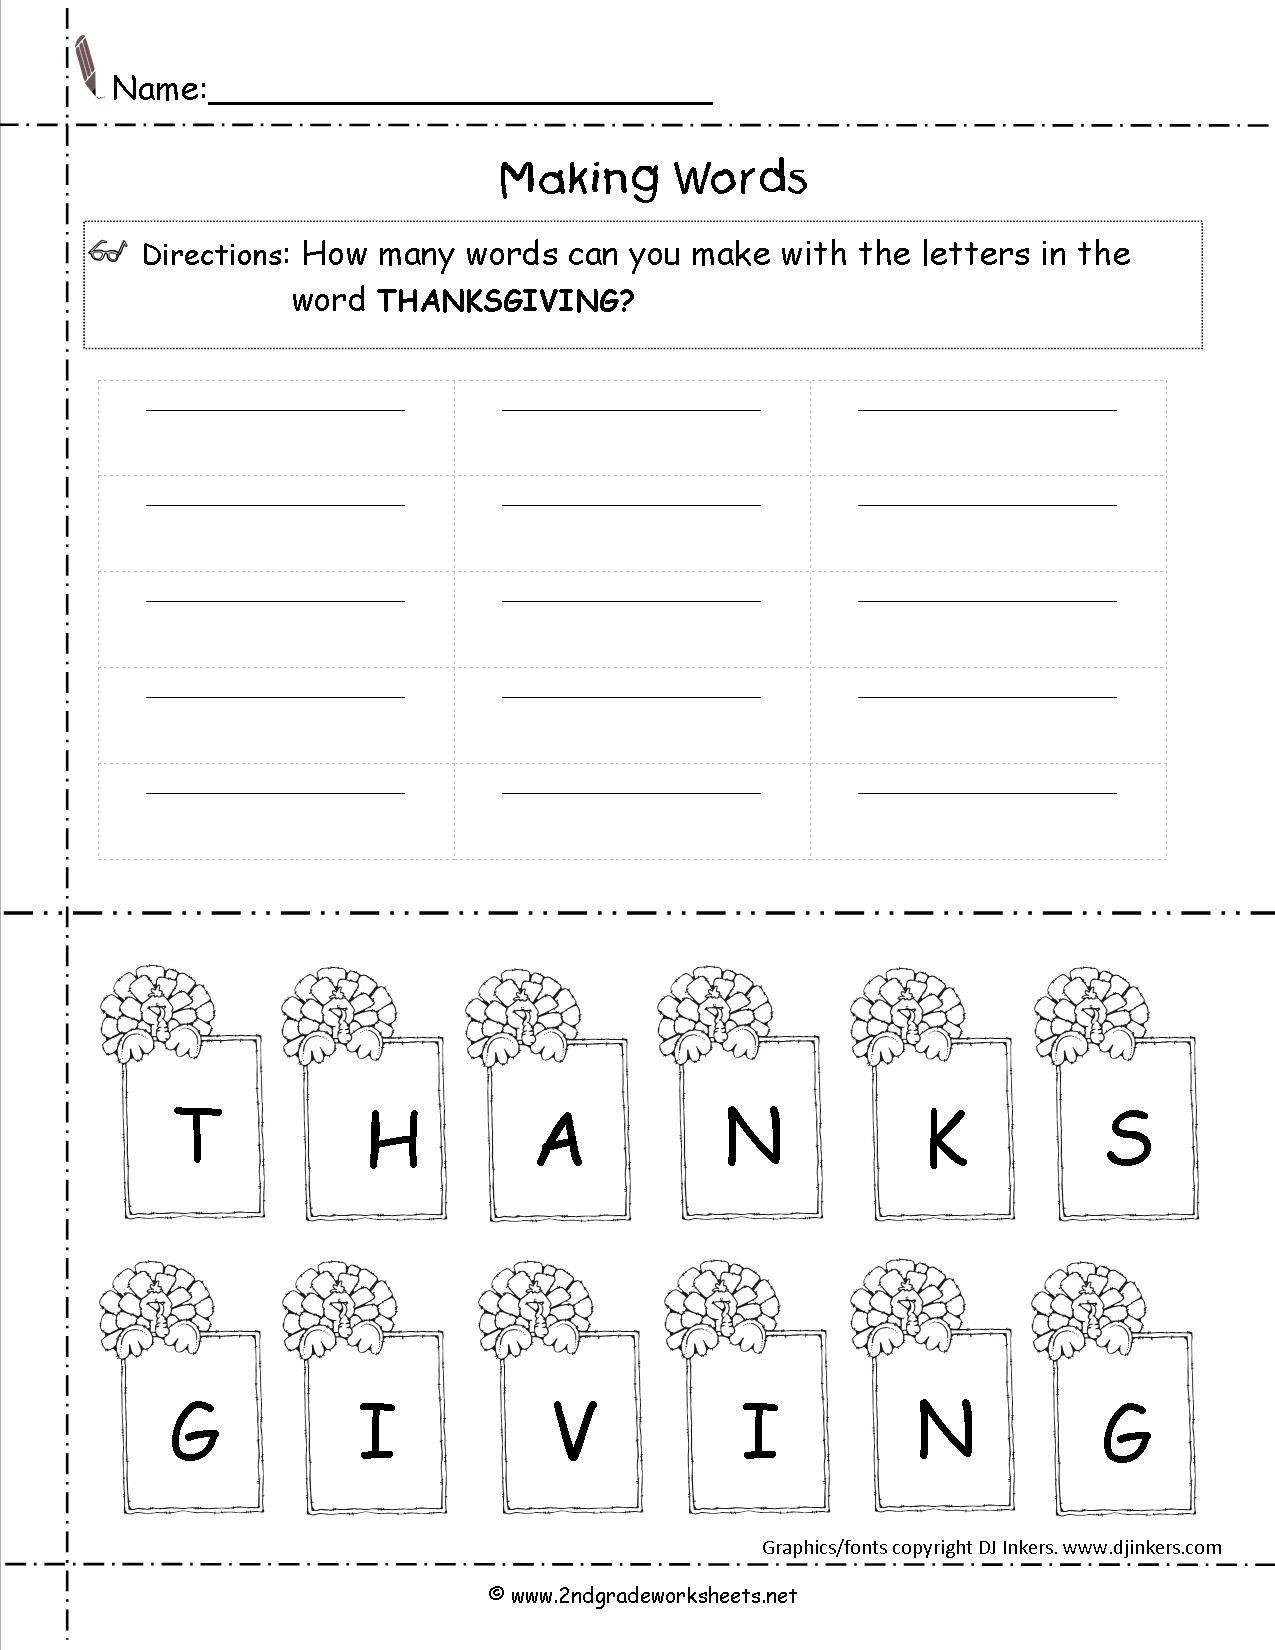 Happy Thanksgiving Worksheets First Grade Thanksgiving Worksheets Thanksgiving Math Worksheets Making Words Kindergarten